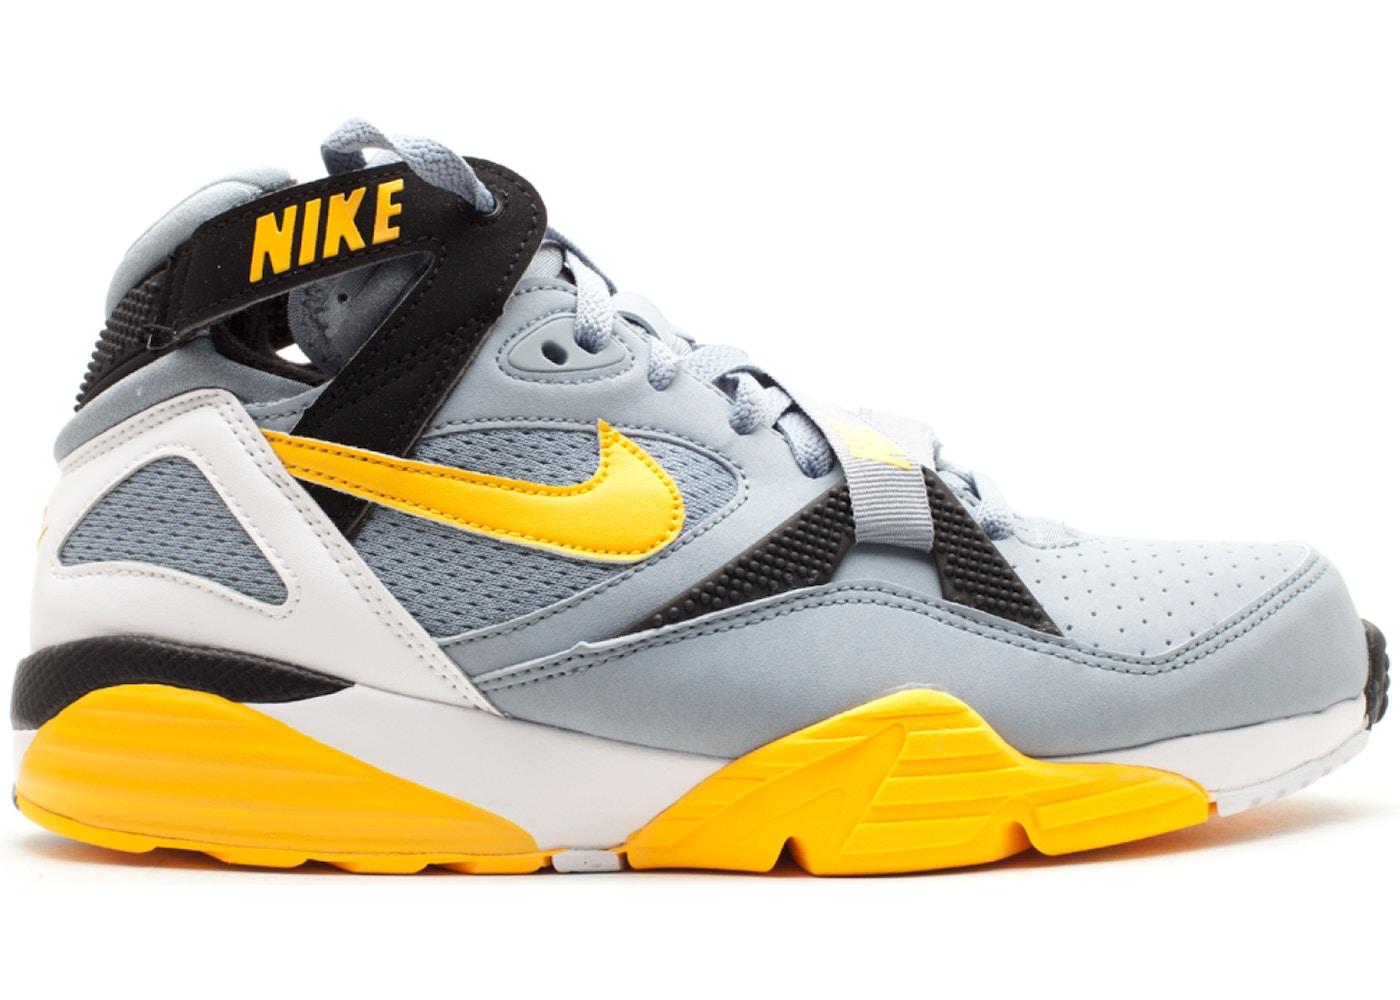 Nike Air Trainer Max 91 Grey Stone Medium Yellow (2010)